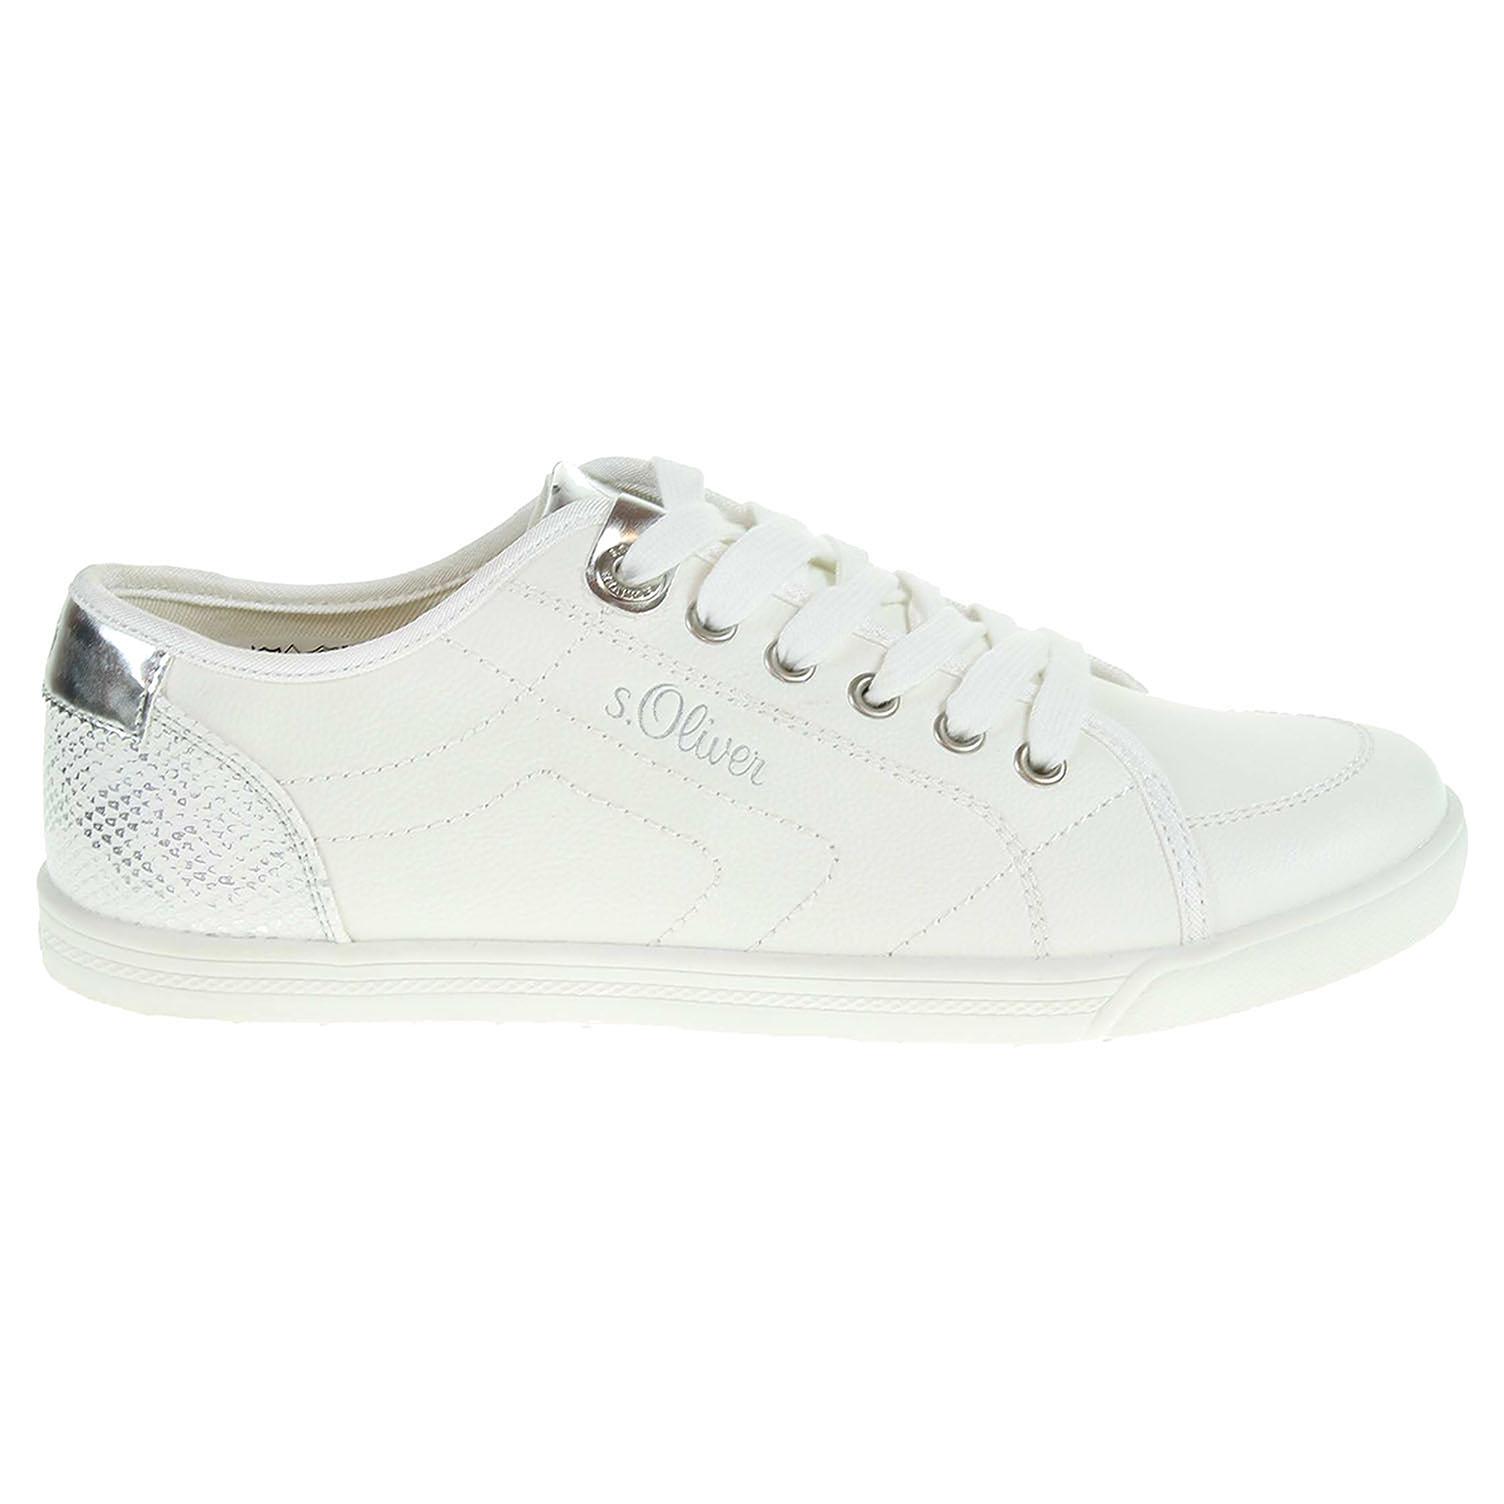 s.Oliver dámská obuv 5-23631-28 bílá 38 bílá bílá